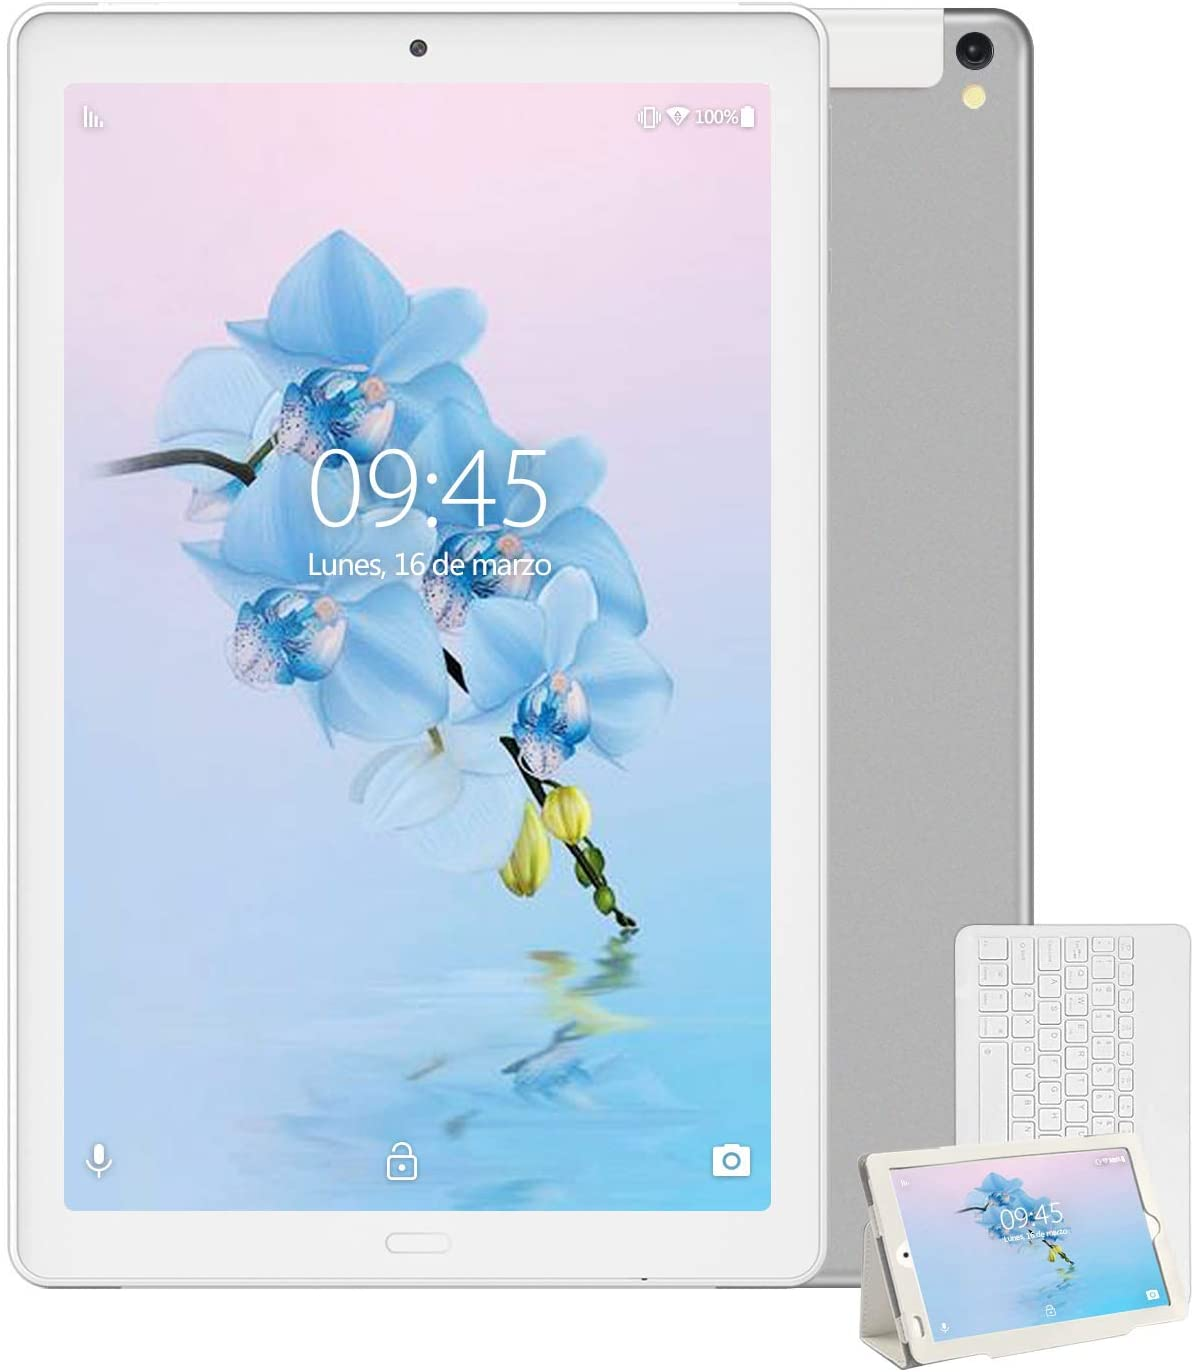 Tablet 10 Pulgadas YESTEL X2, 3GB+32GB, Android 8.1,4G WiFi/Dobles SIM, Tableta con Tastiera, 4 Core, 8000mAh, 1280X800 HD IPS, FM,Plata